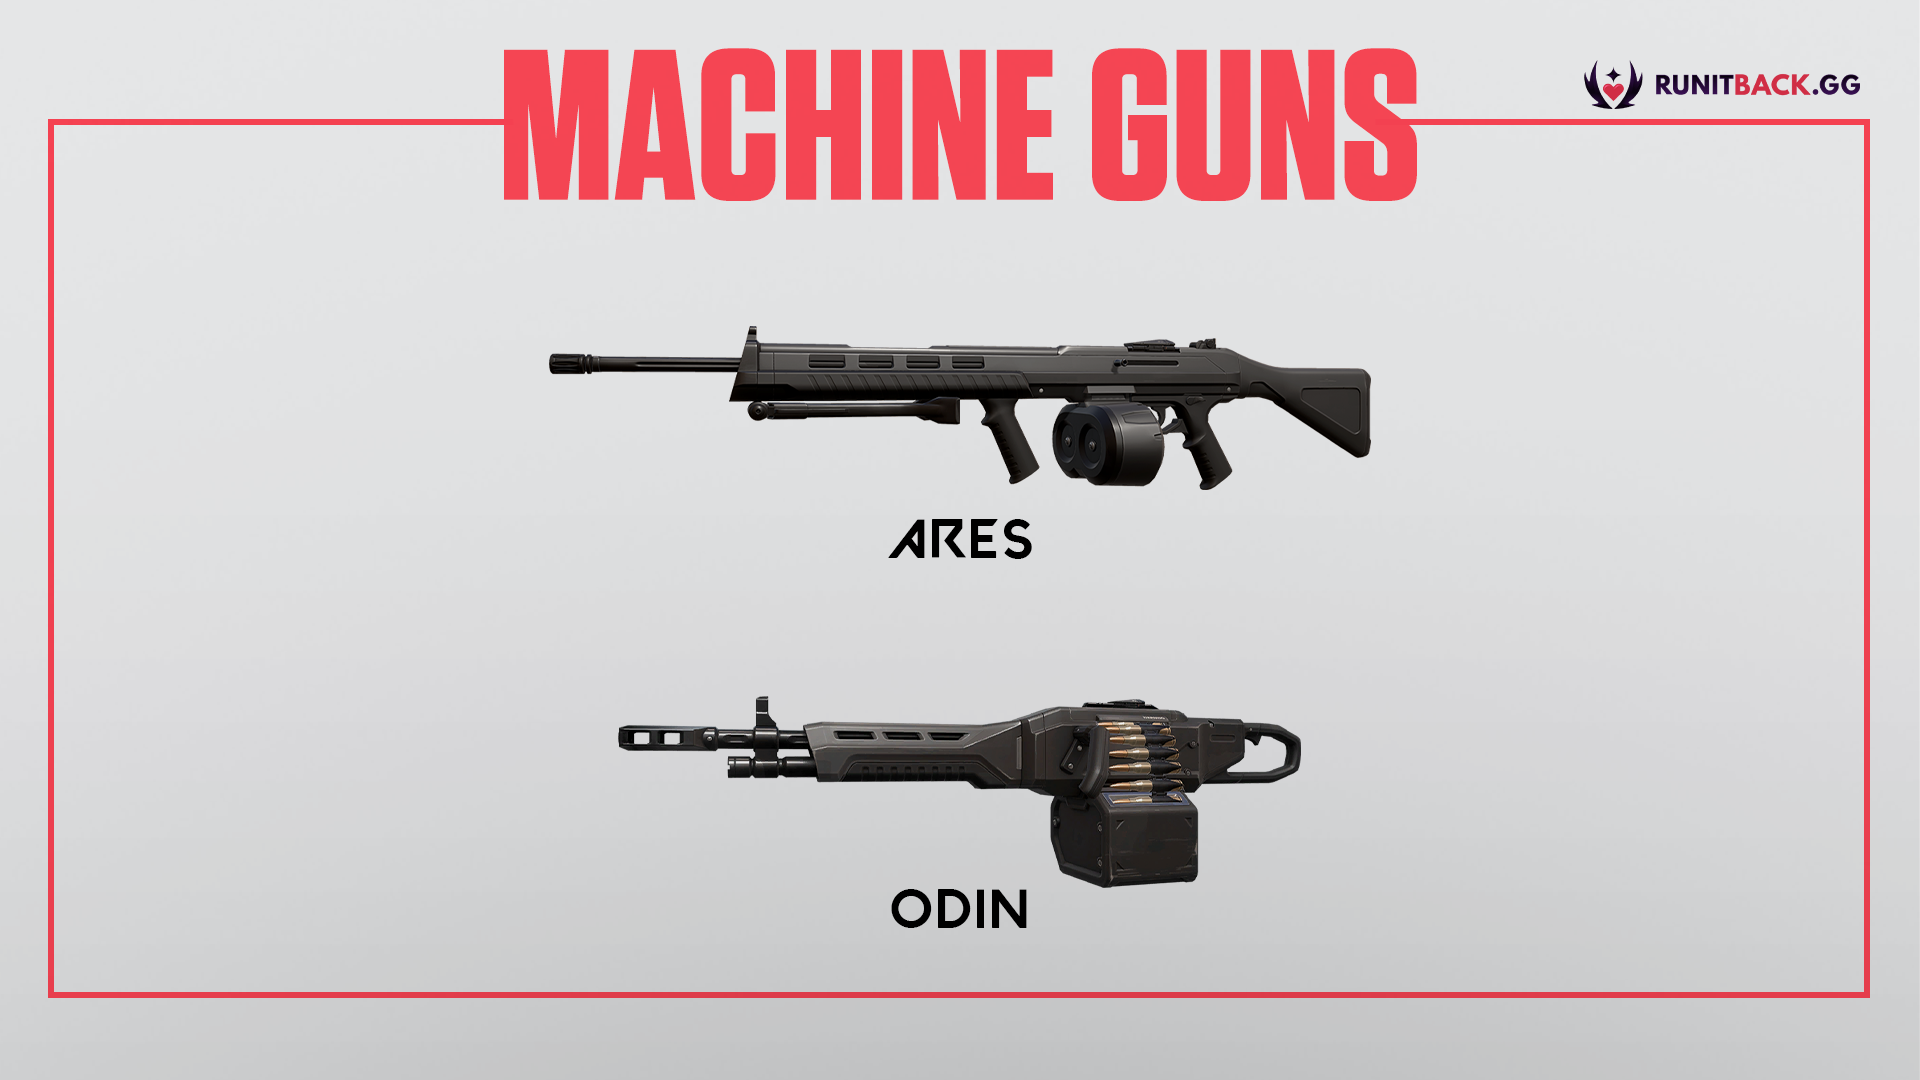 Valorant Weapon Guide: Machine Guns